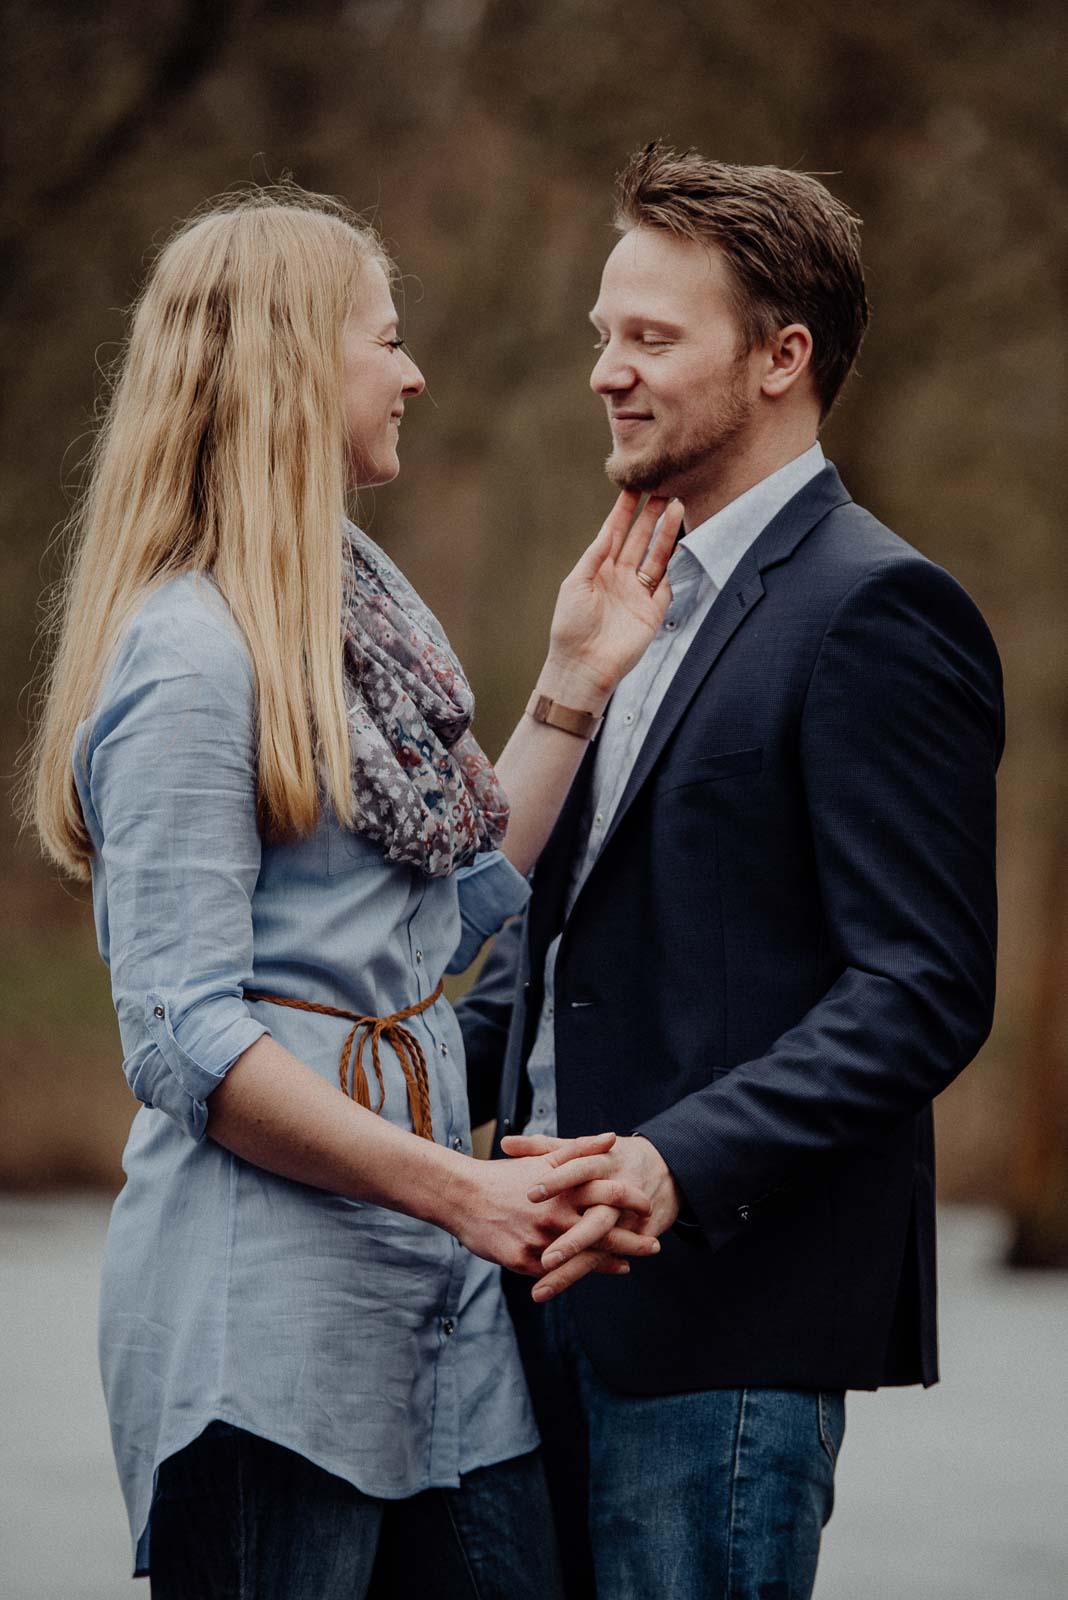 008-verlobungsshooting-engagement-fotograf-witten-rombergpark-dortmund